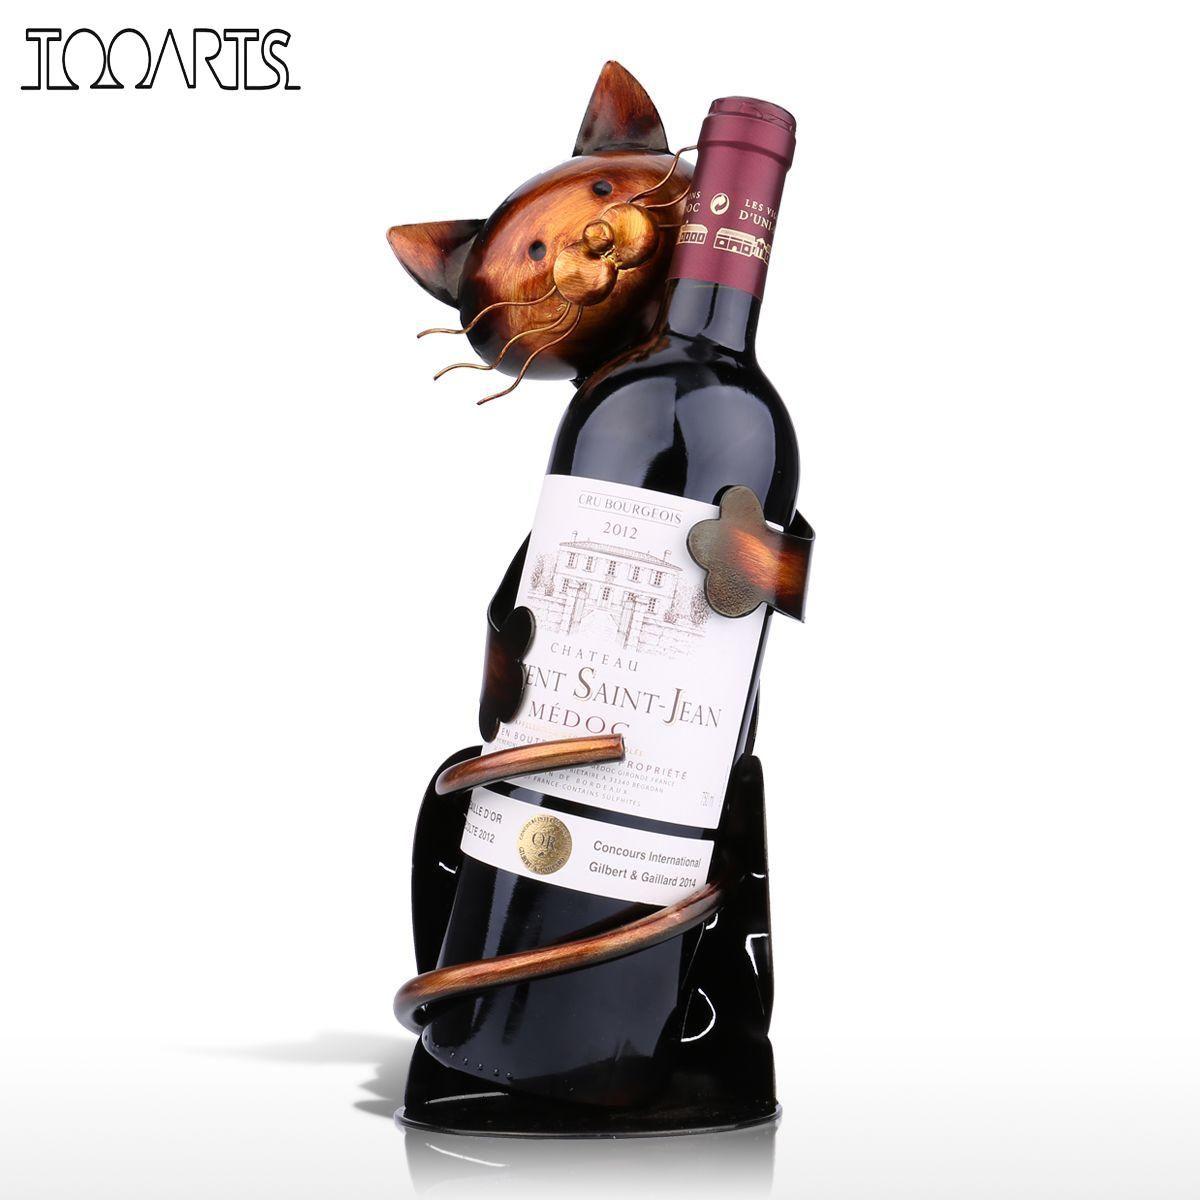 TOOARTS Cat Wine Rack Wine Holder Shelf Metal Sculpture <font><b>Practical</b></font> Sculpture Wine stand Home Decoration Interior Crafts